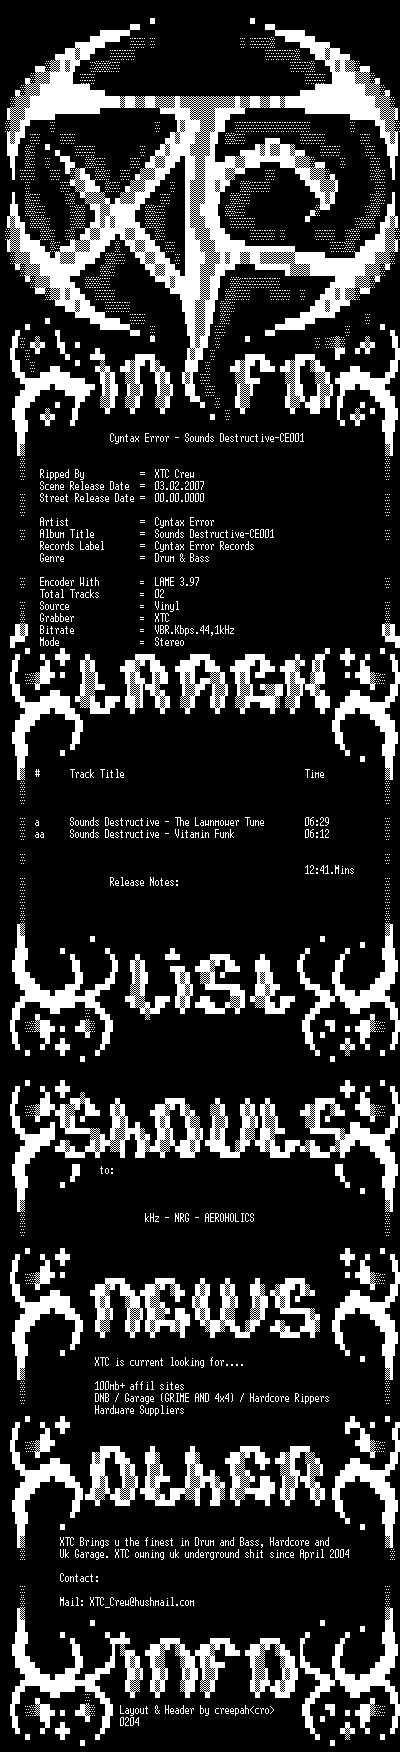 [DnB] Sounds Destructive – CE001 – Cyntax Error Rec. Ce00110